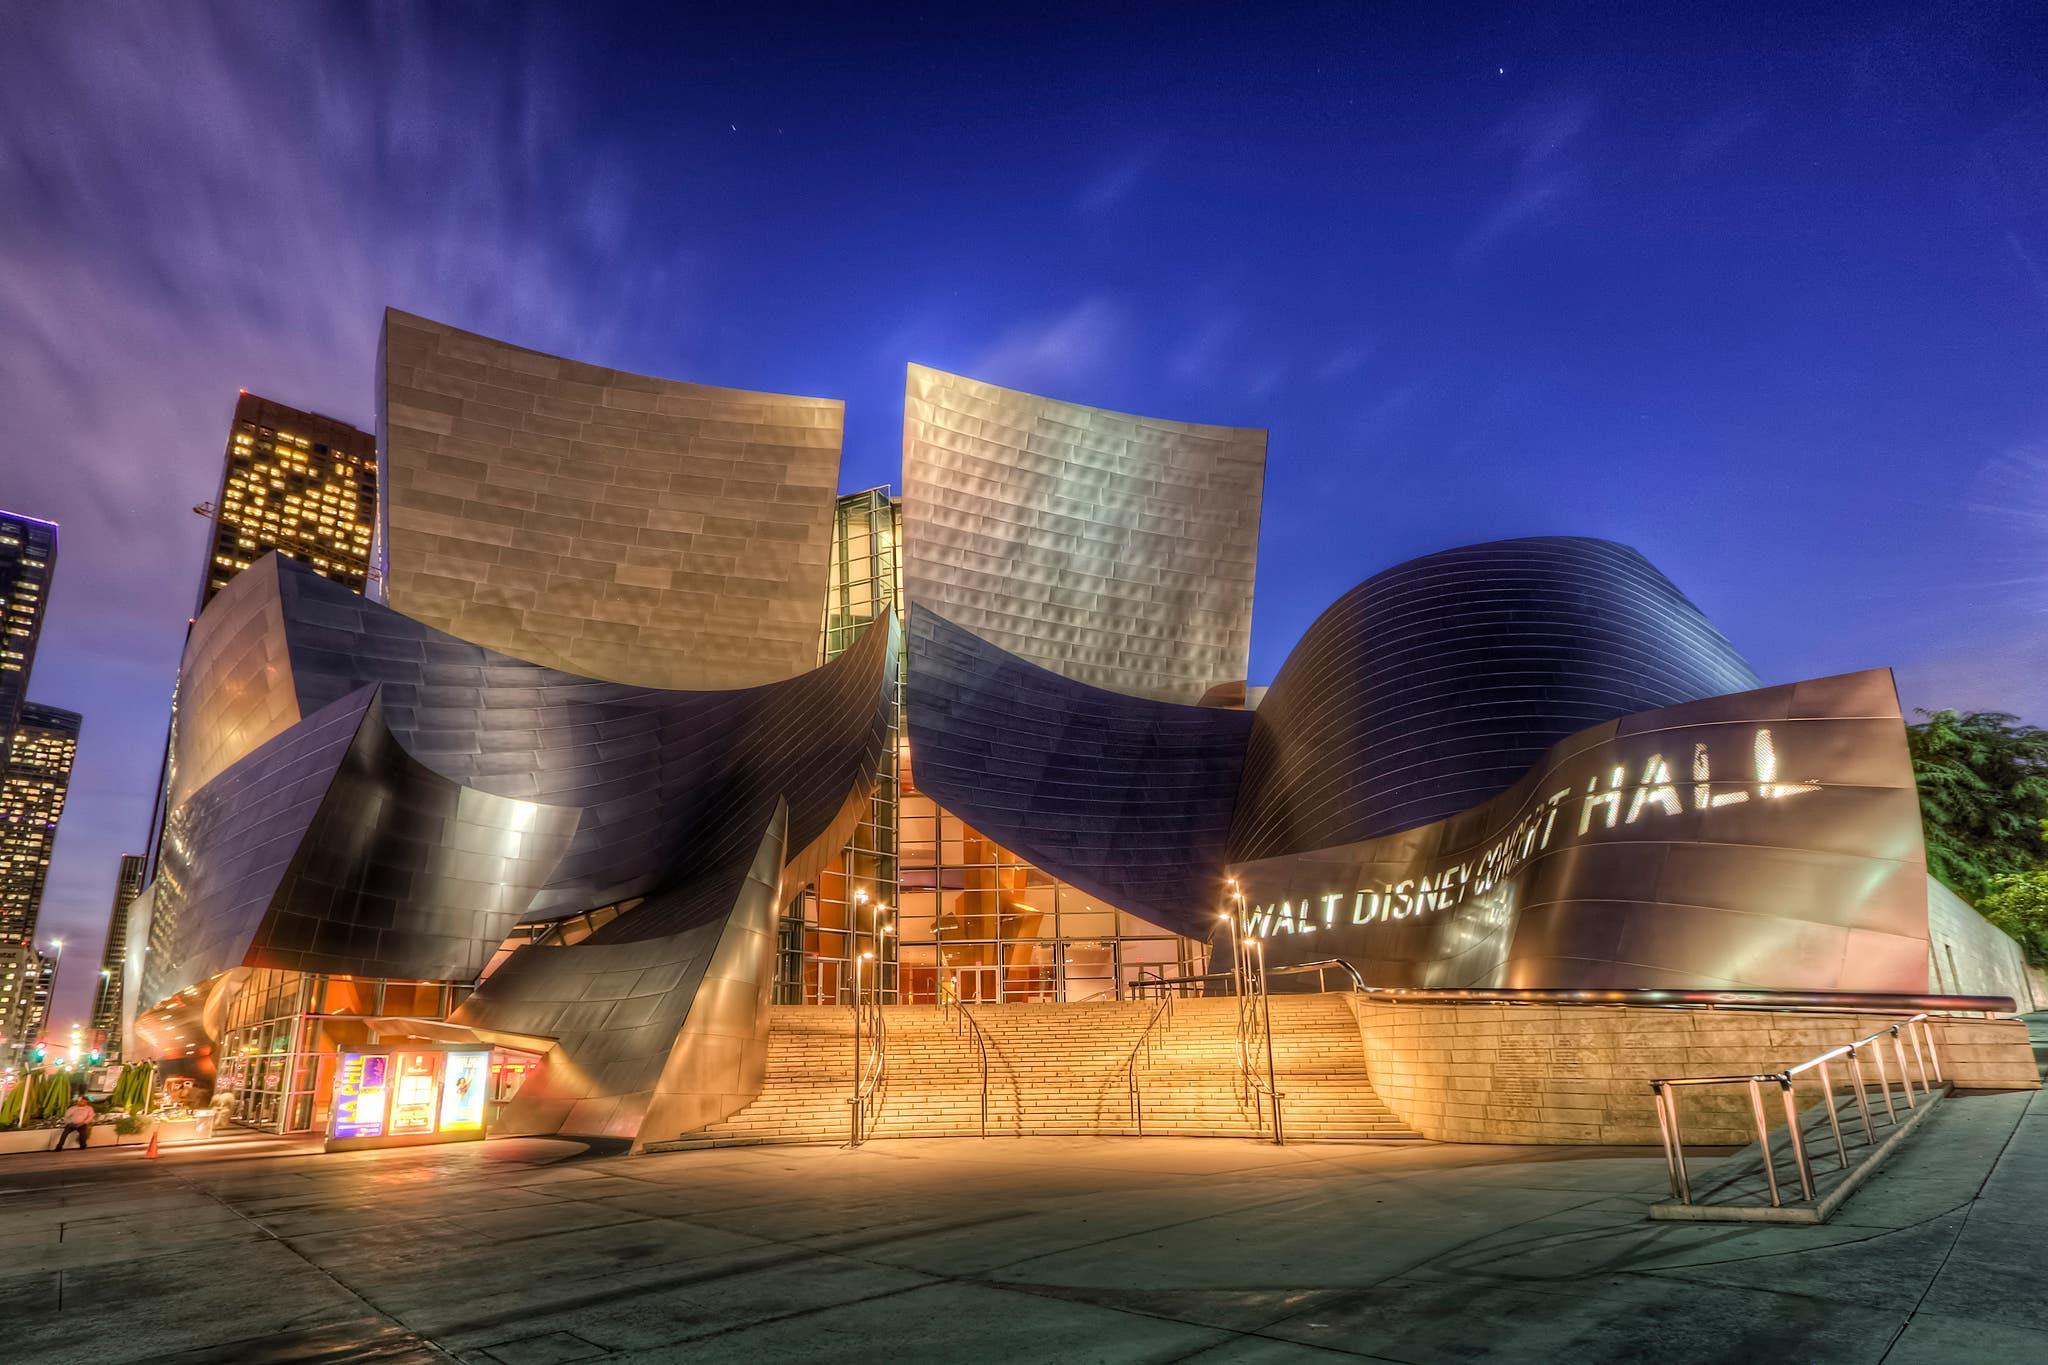 Exterior of Walt Disney Concert Hall at night